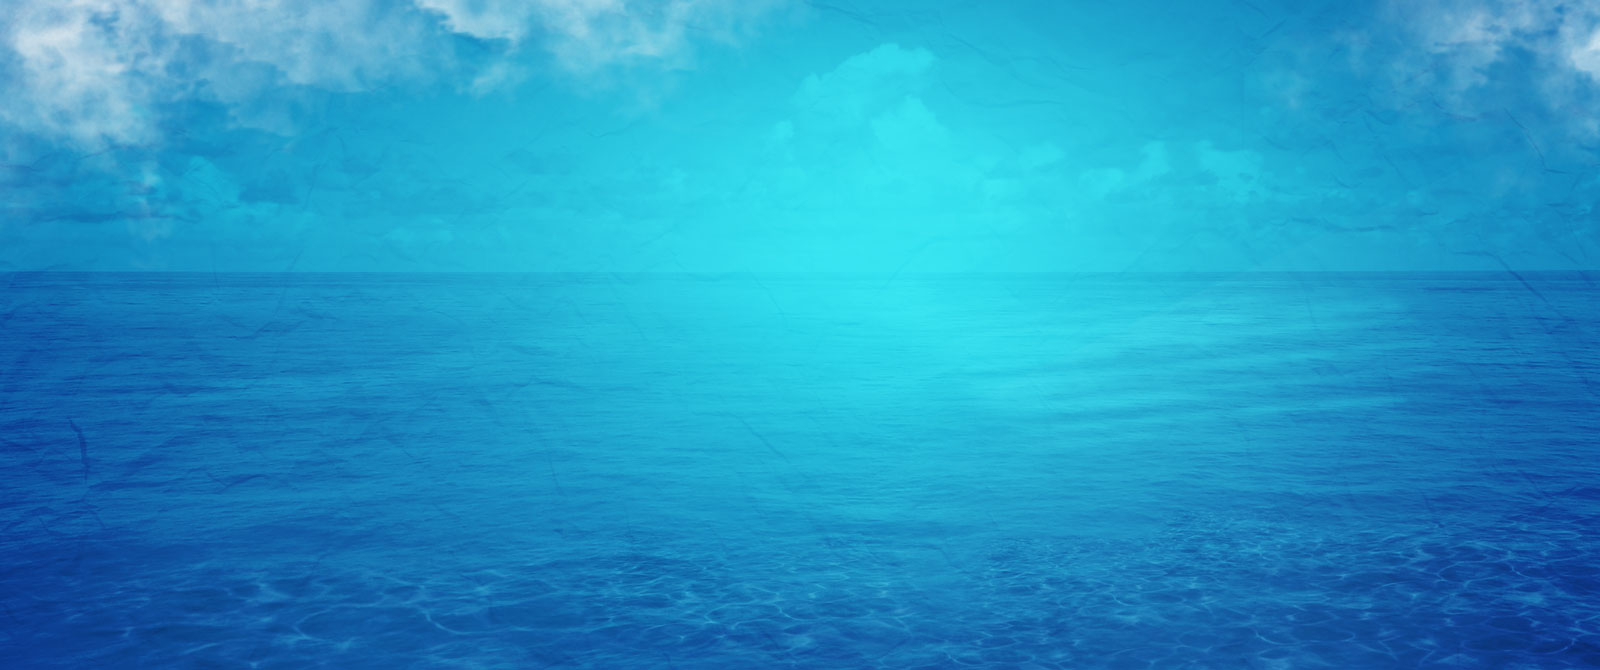 bg-blue-water